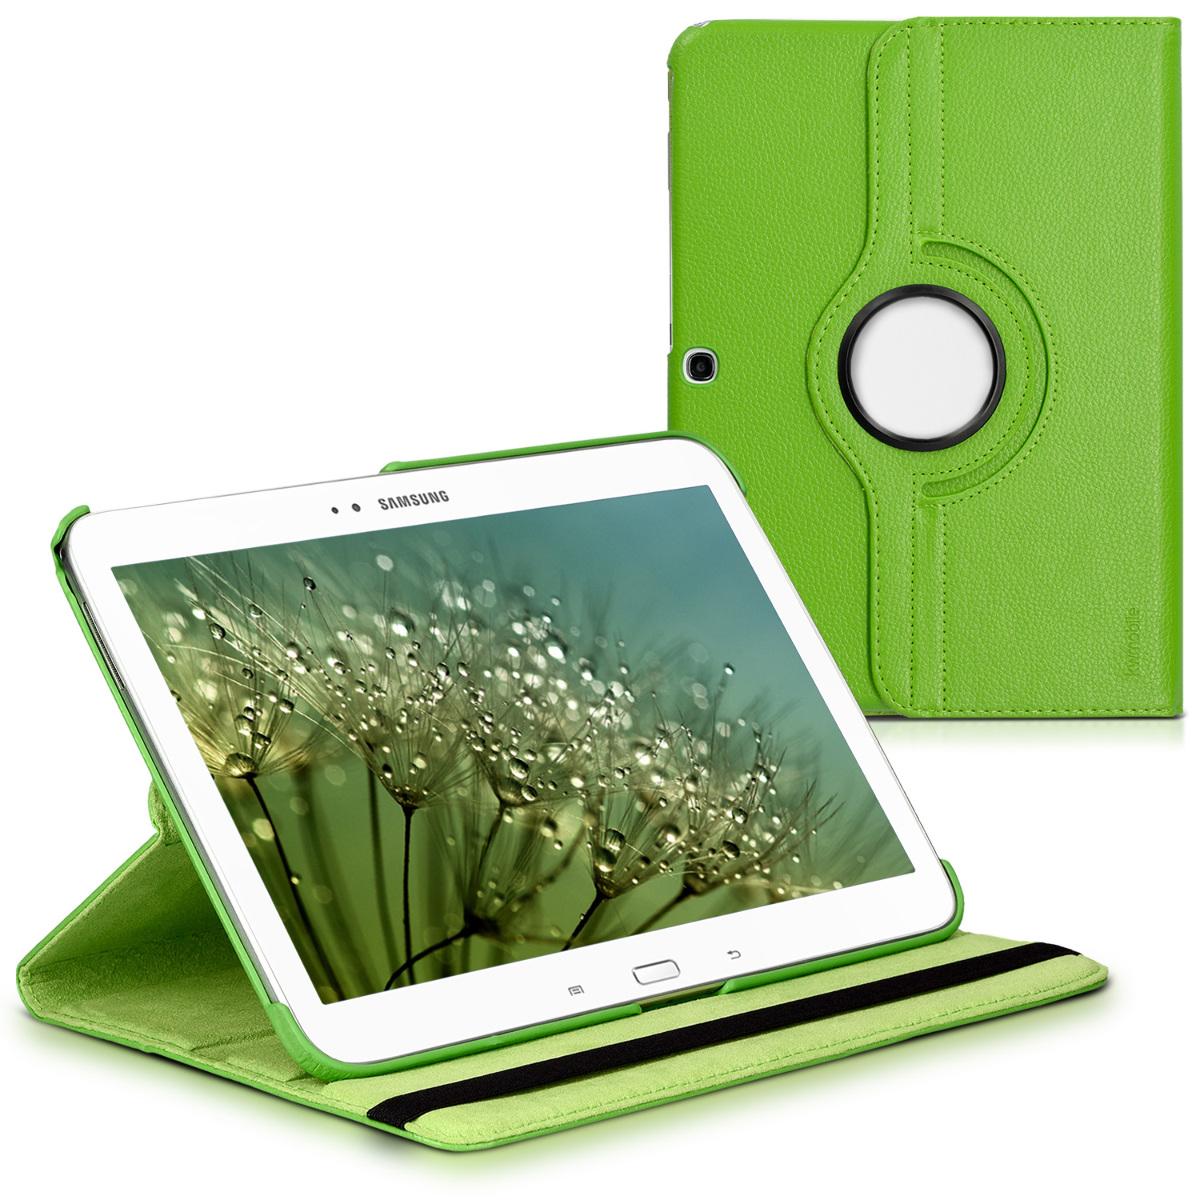 KW Θήκη 360° Samsung Galaxy Tab 3 10.1 P5200/P5210 - Συνθετικό Δέρμα - Green (14618.07)